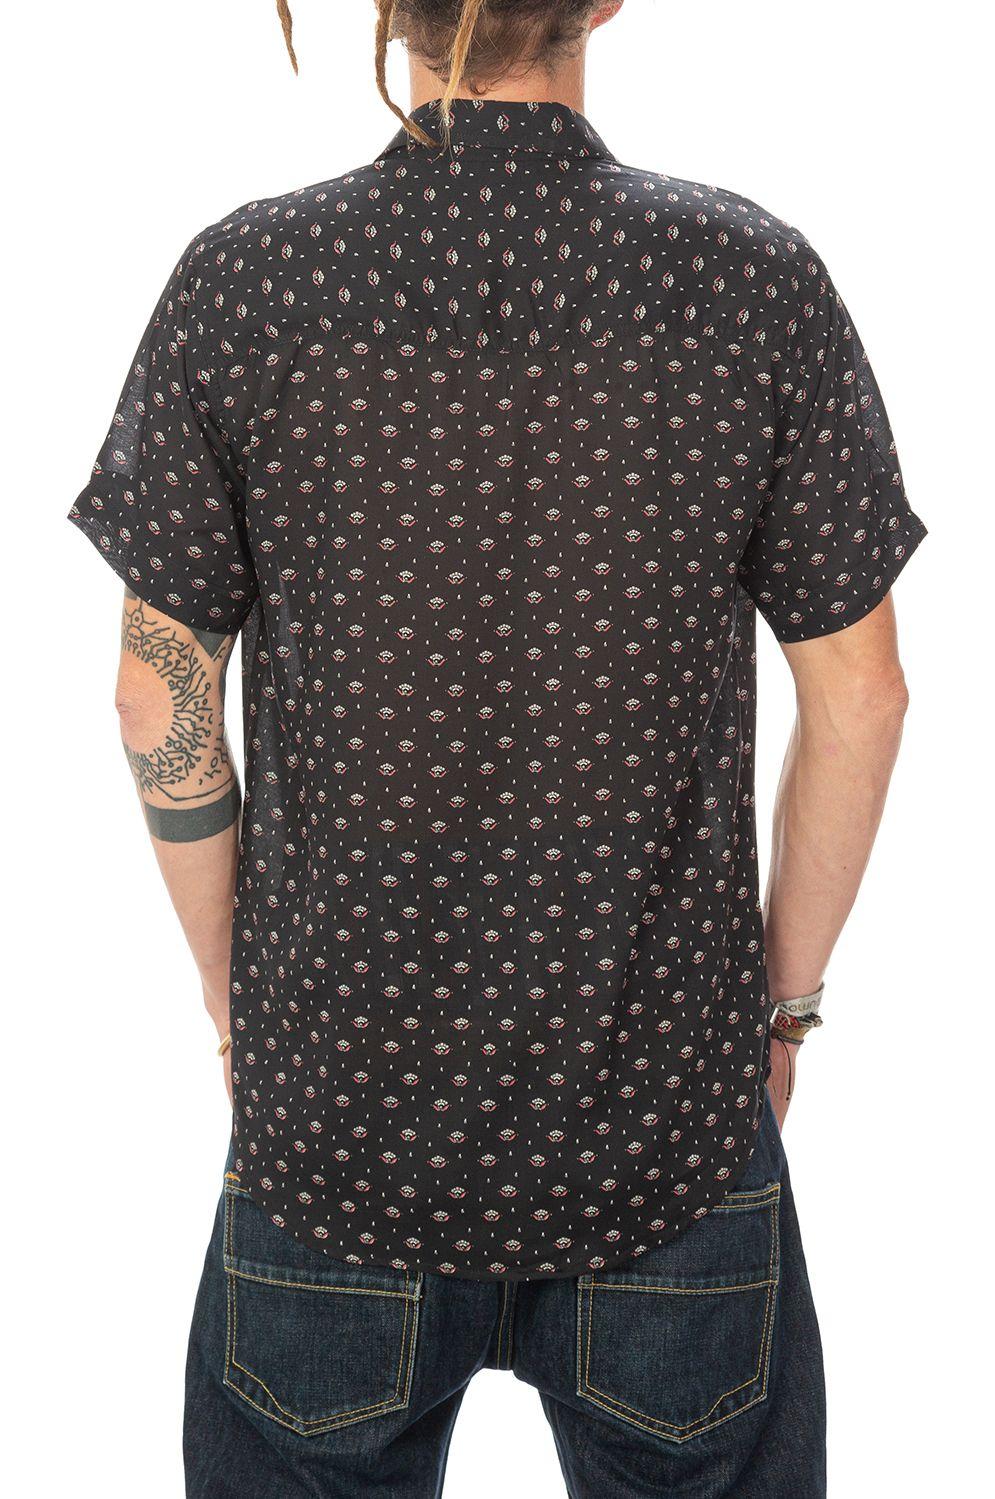 Camisa Black Mamba M2 BLACK ROYAL Black/Multi